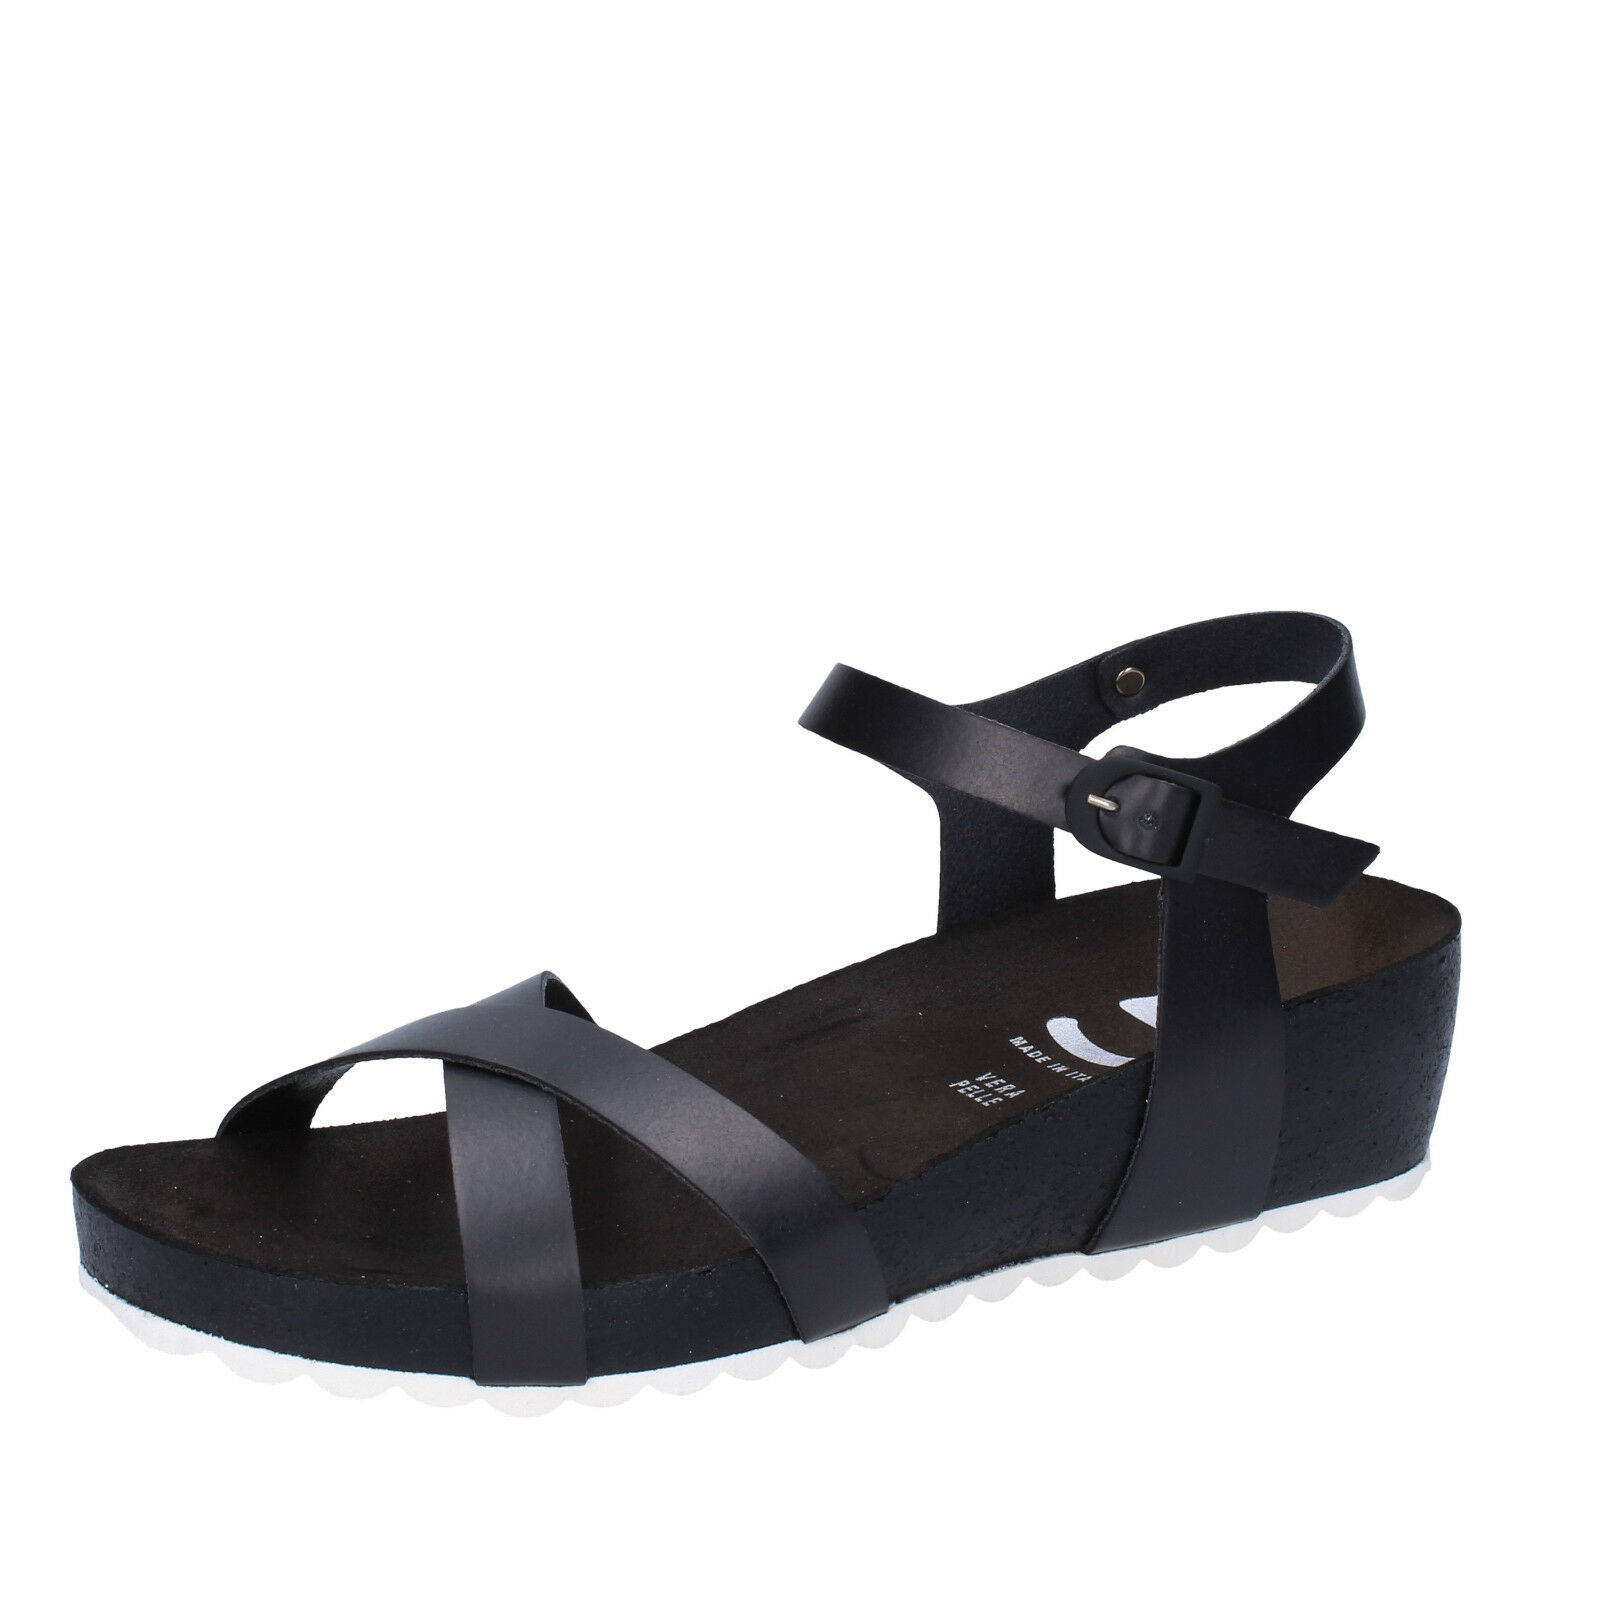 Scarpe donna sandali 5 PRO JECT 36 EU sandali donna nero pelle AC700-B e85d17